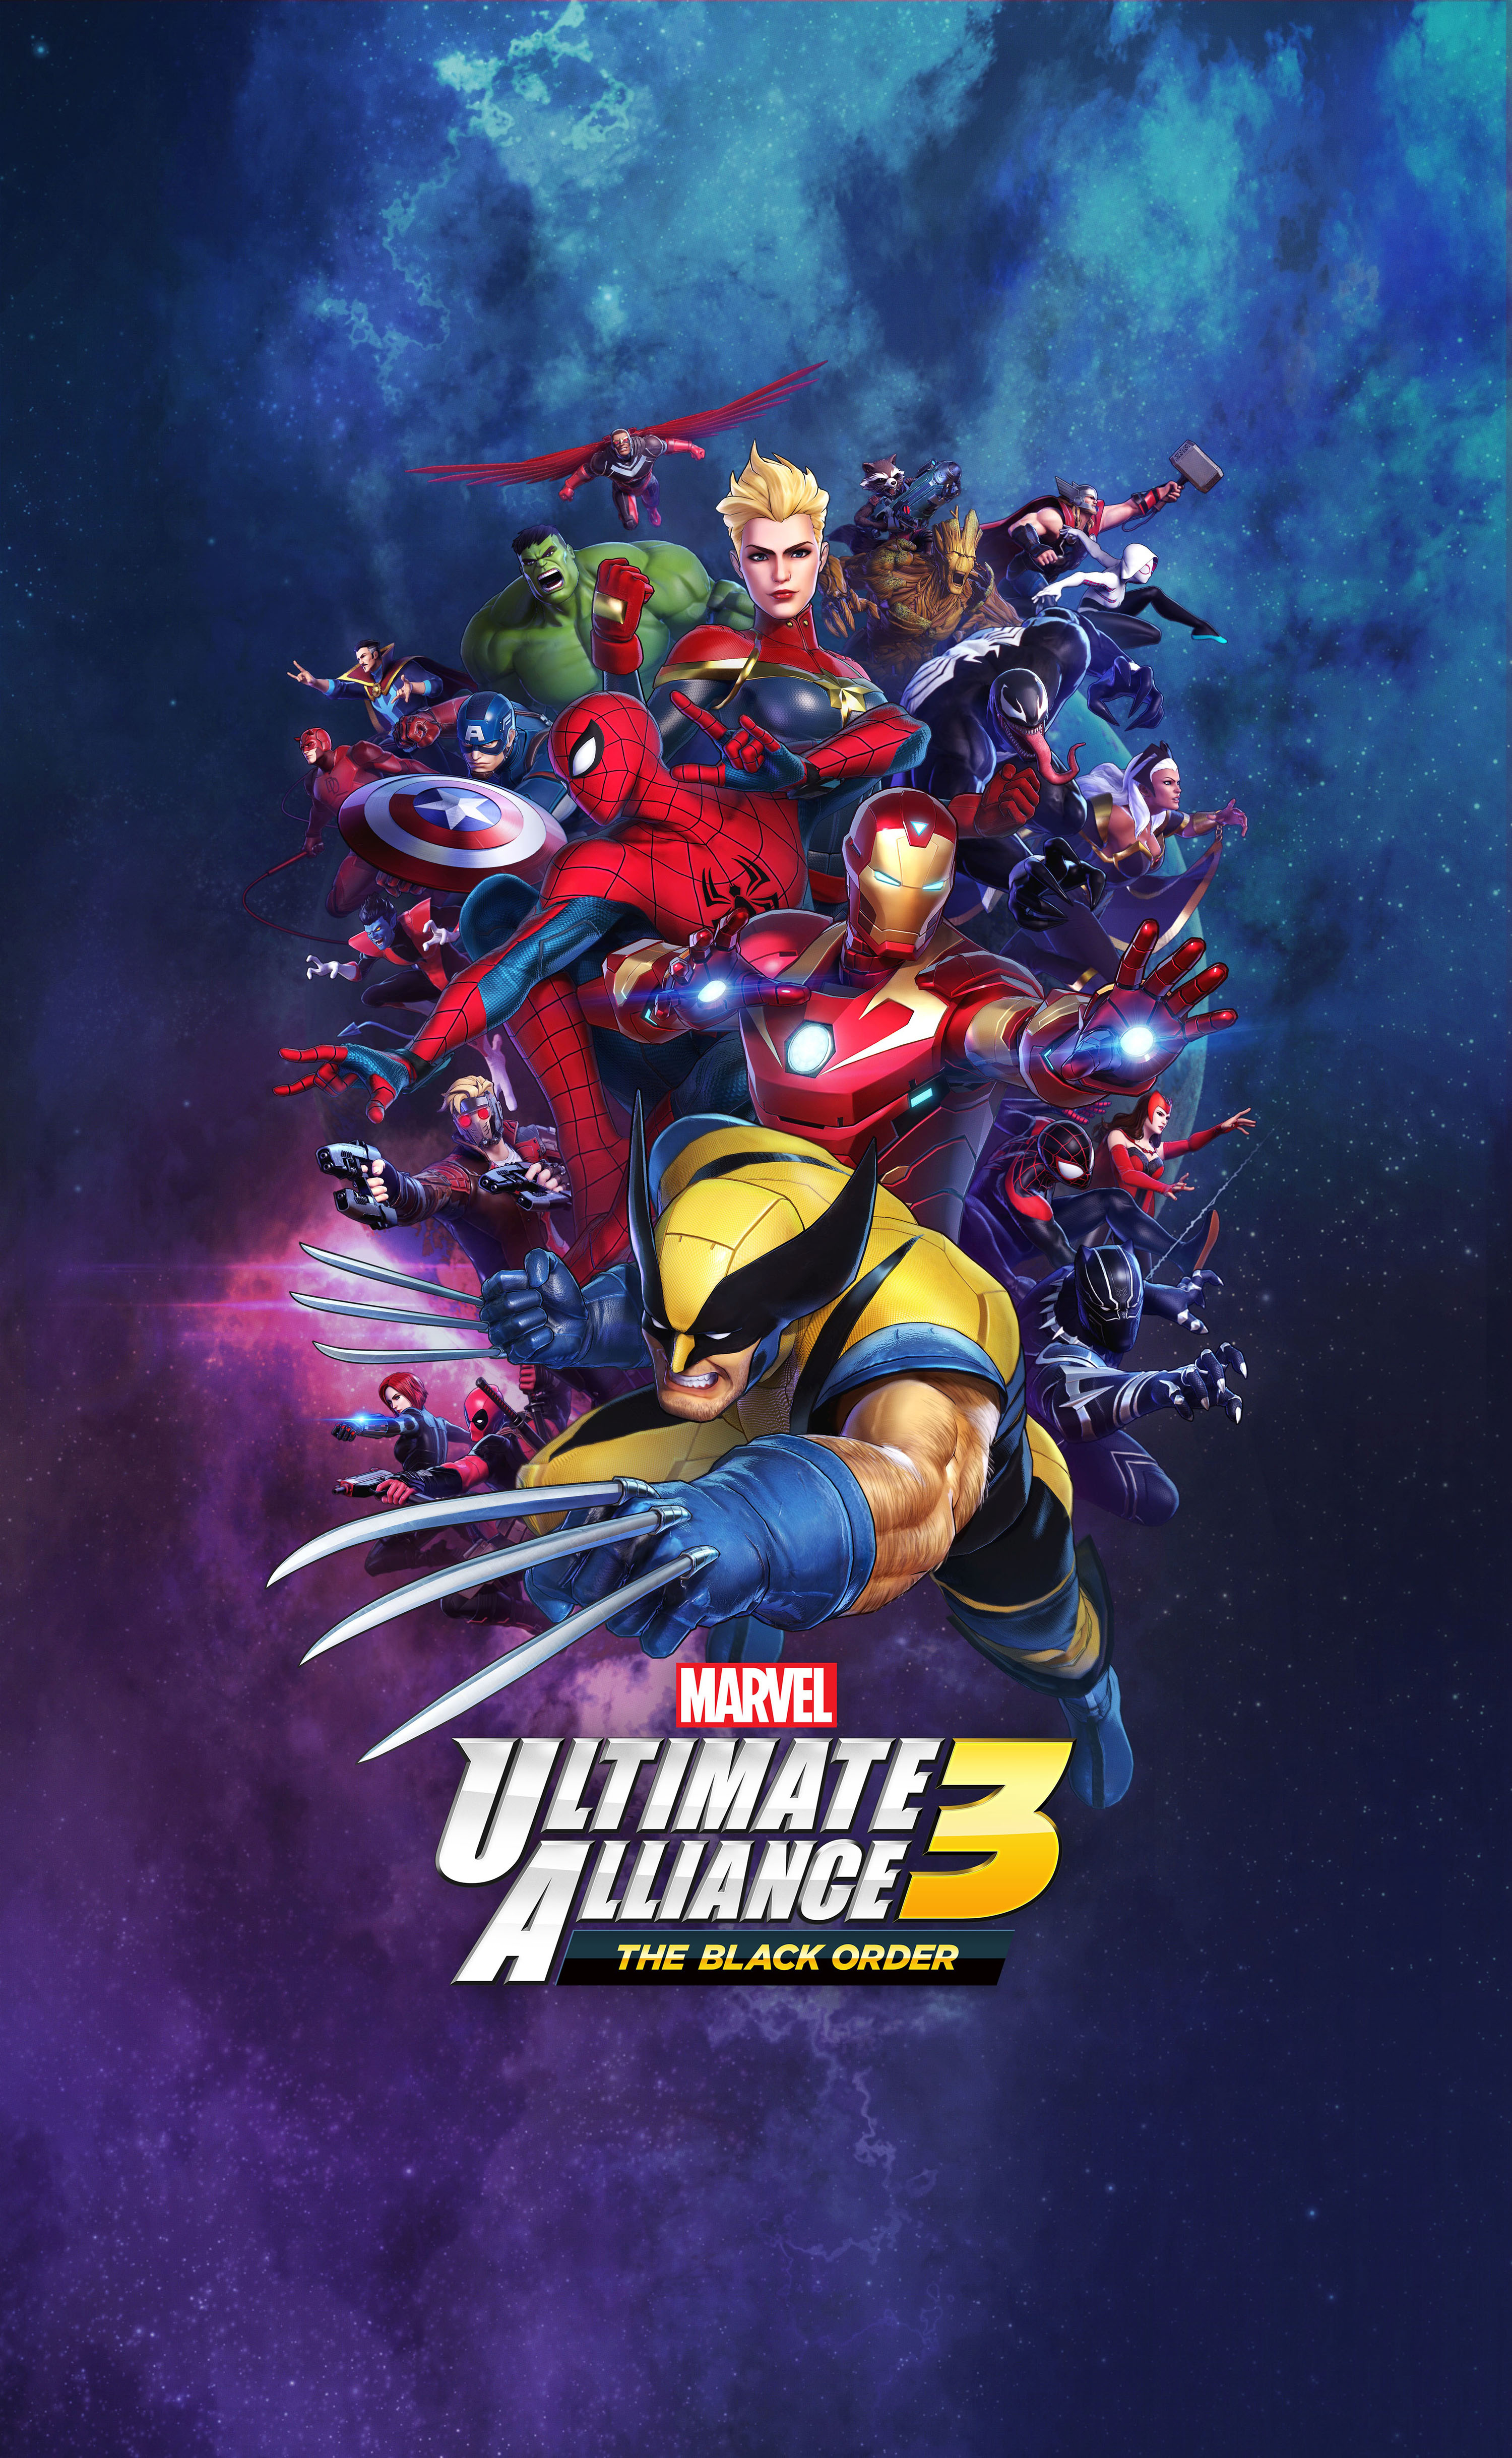 Marvel Ultimate Alliance 3 The Black Order Wallpaper Hd Games 4k